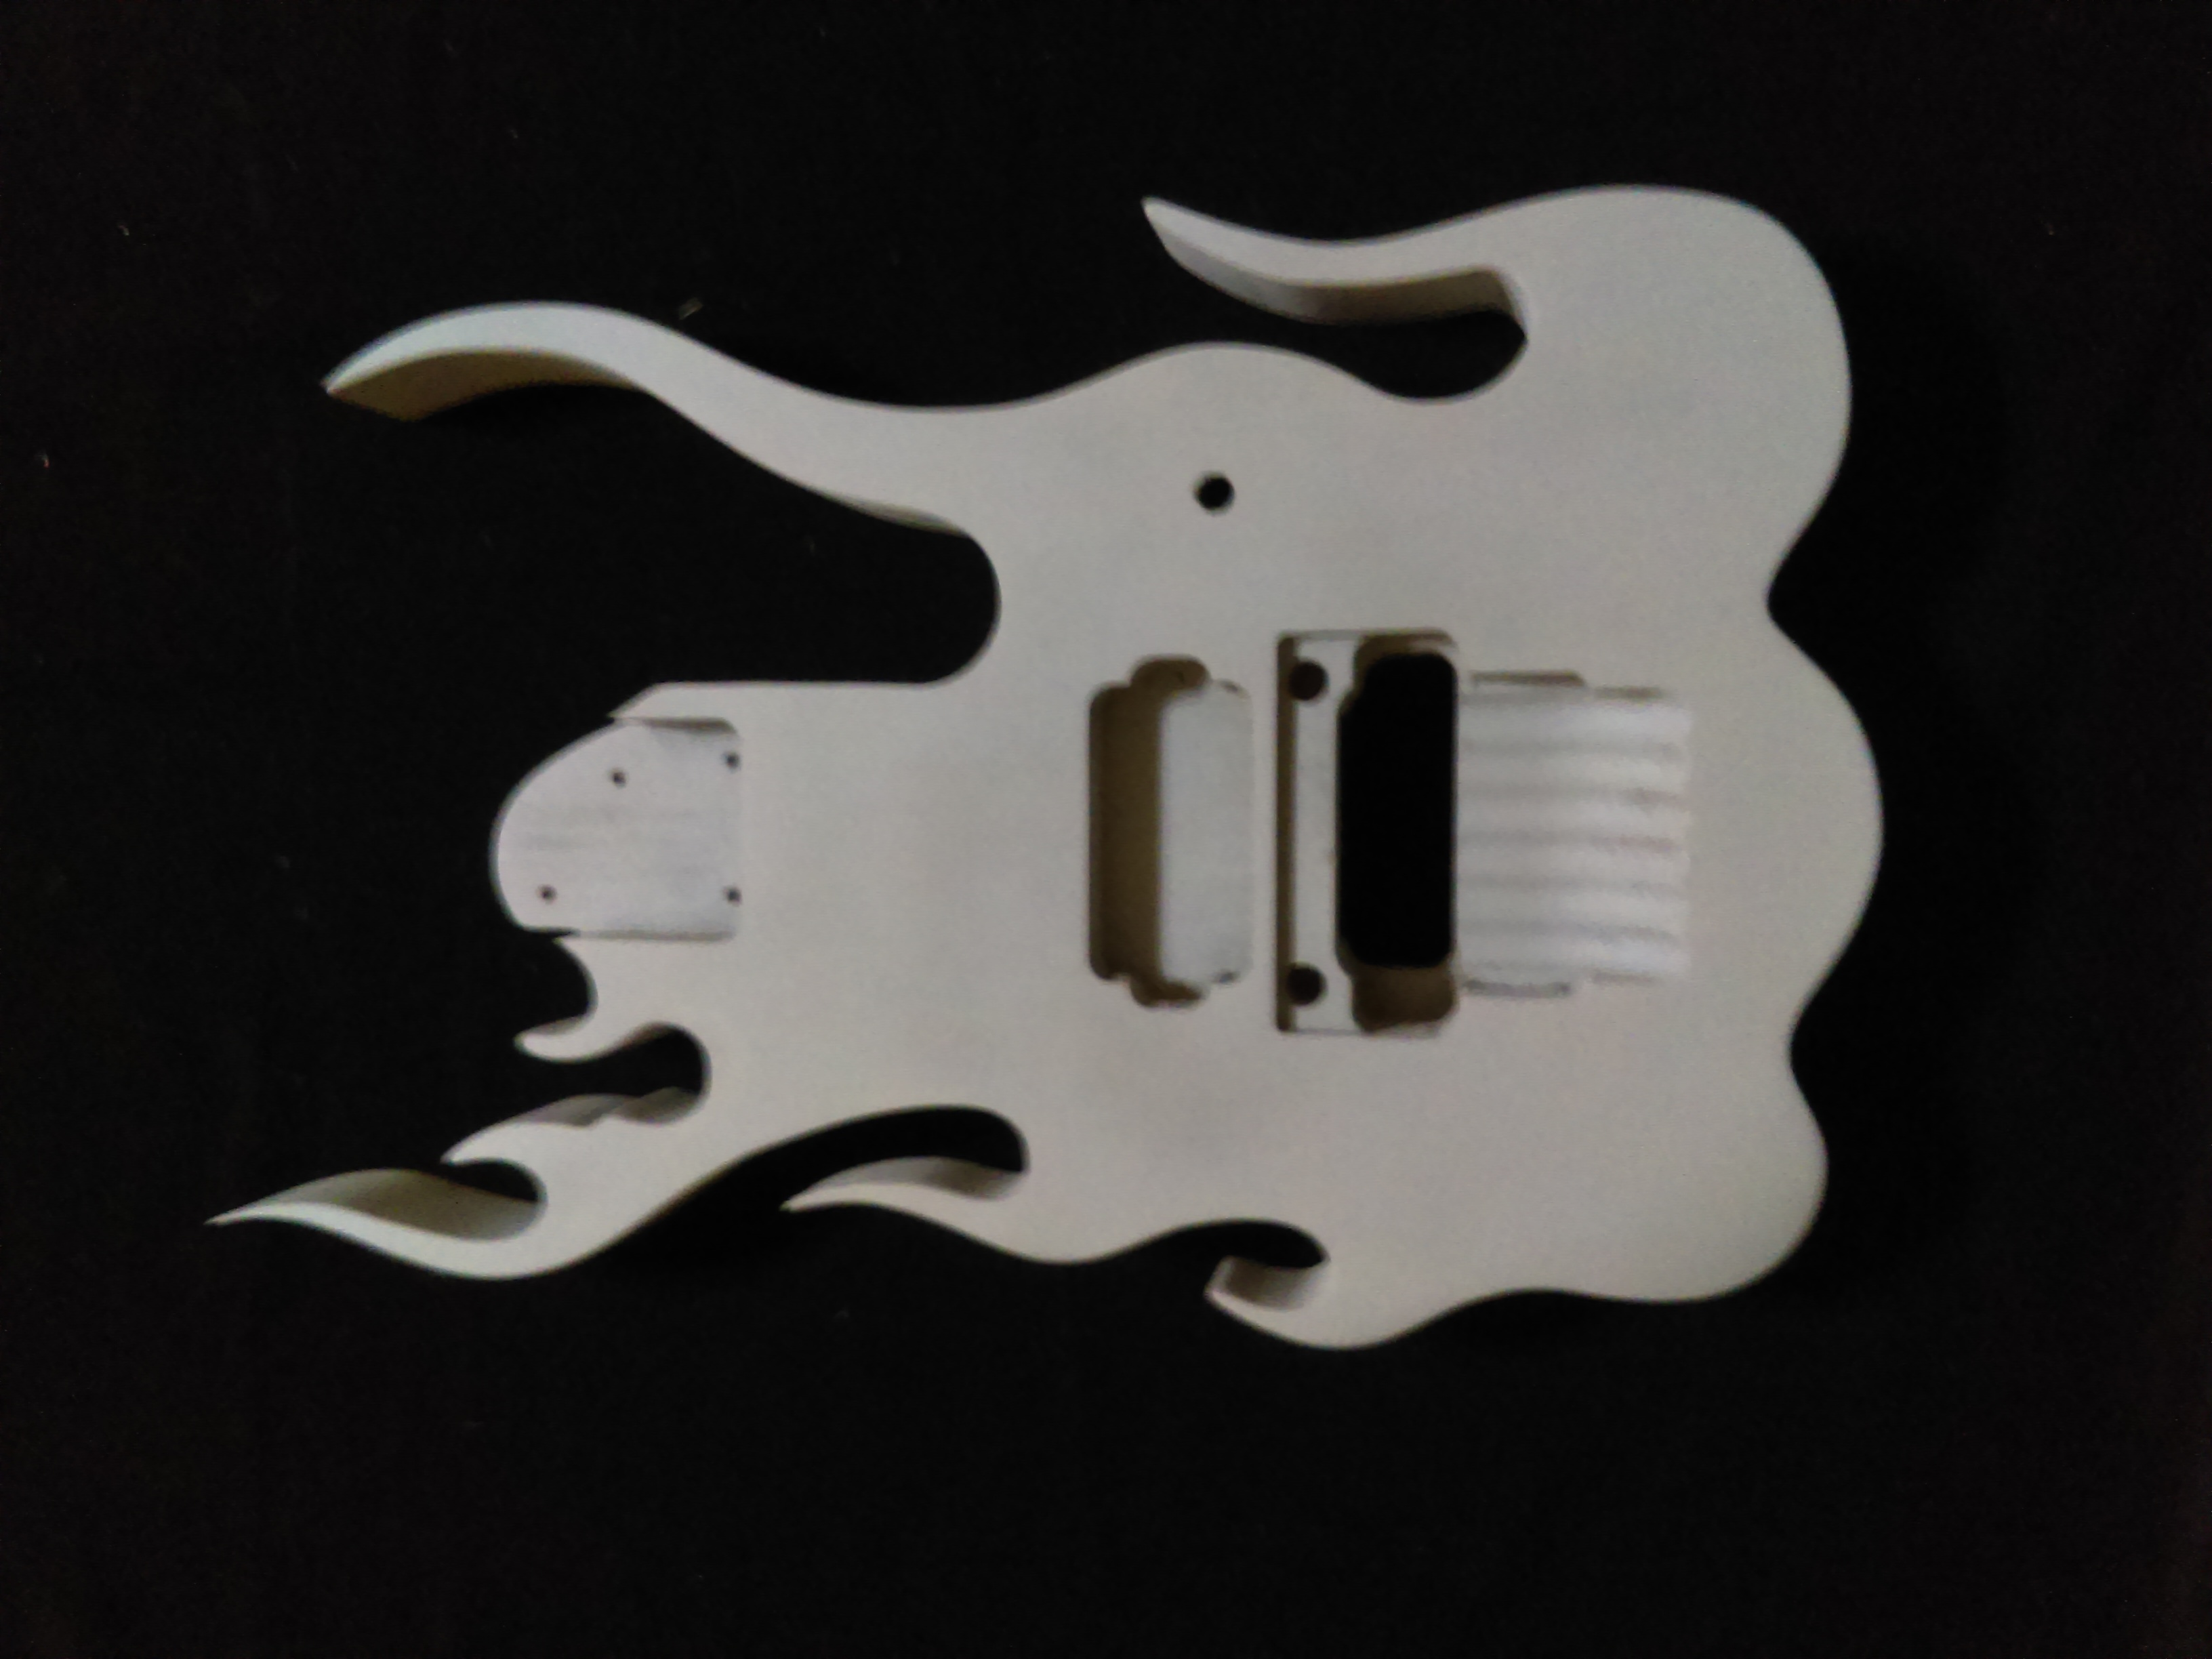 steve_vai_jem_flame_guitar_ibanez_airbru